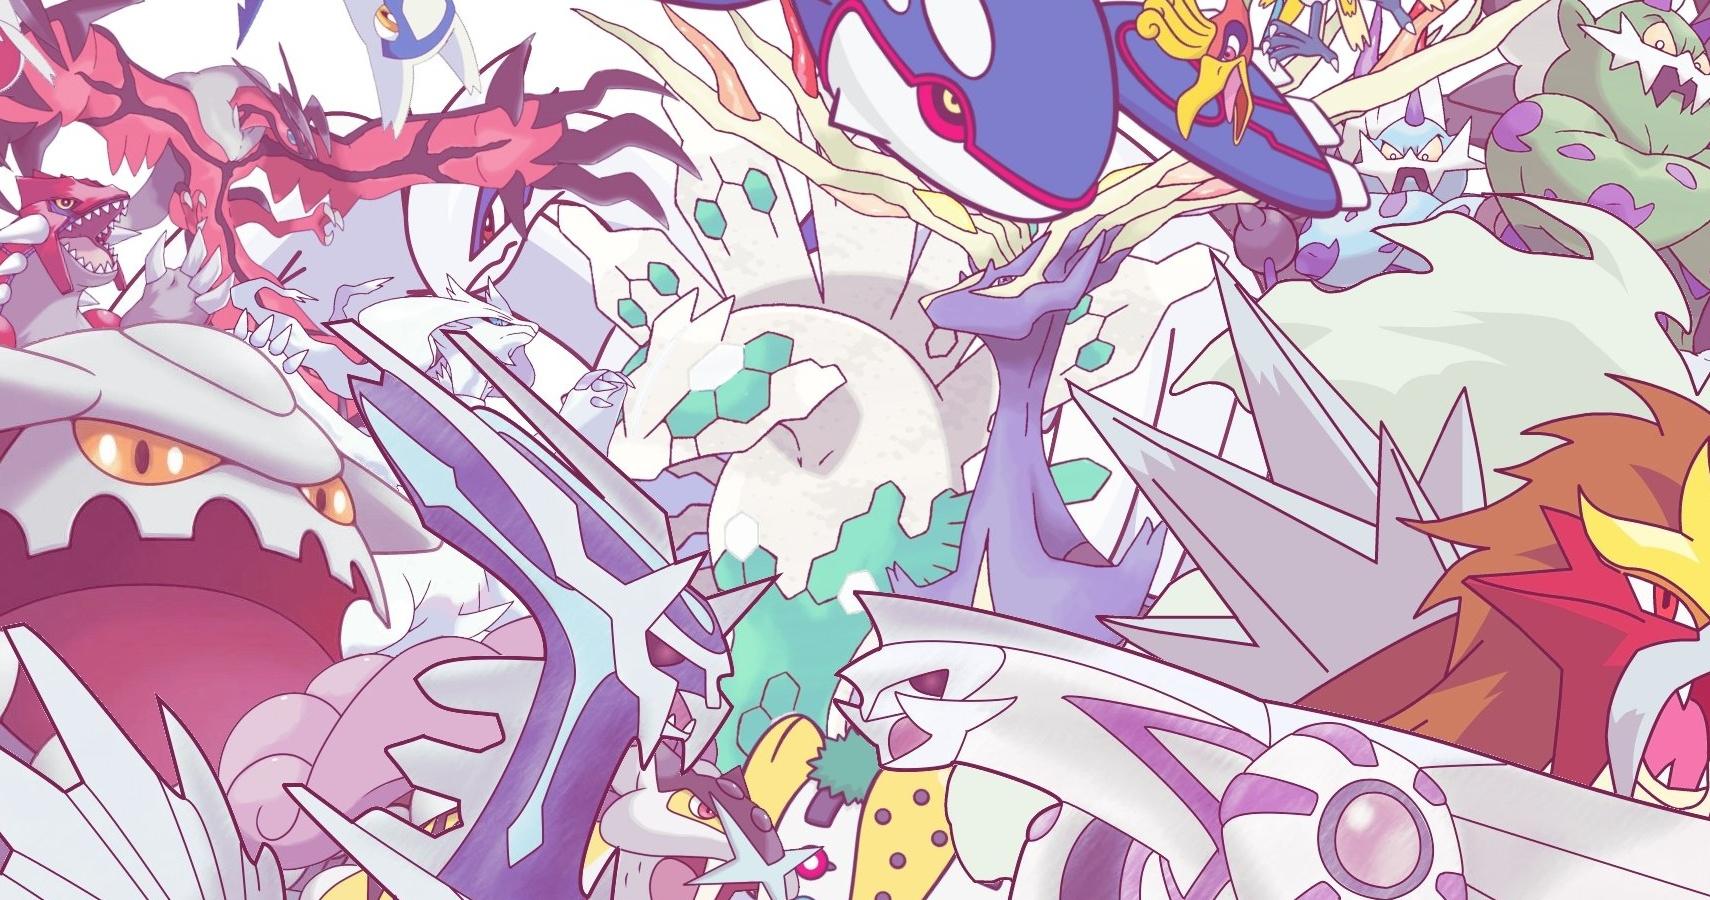 The 10 Best Legendary Pokémon Designs & Looks, Ranked